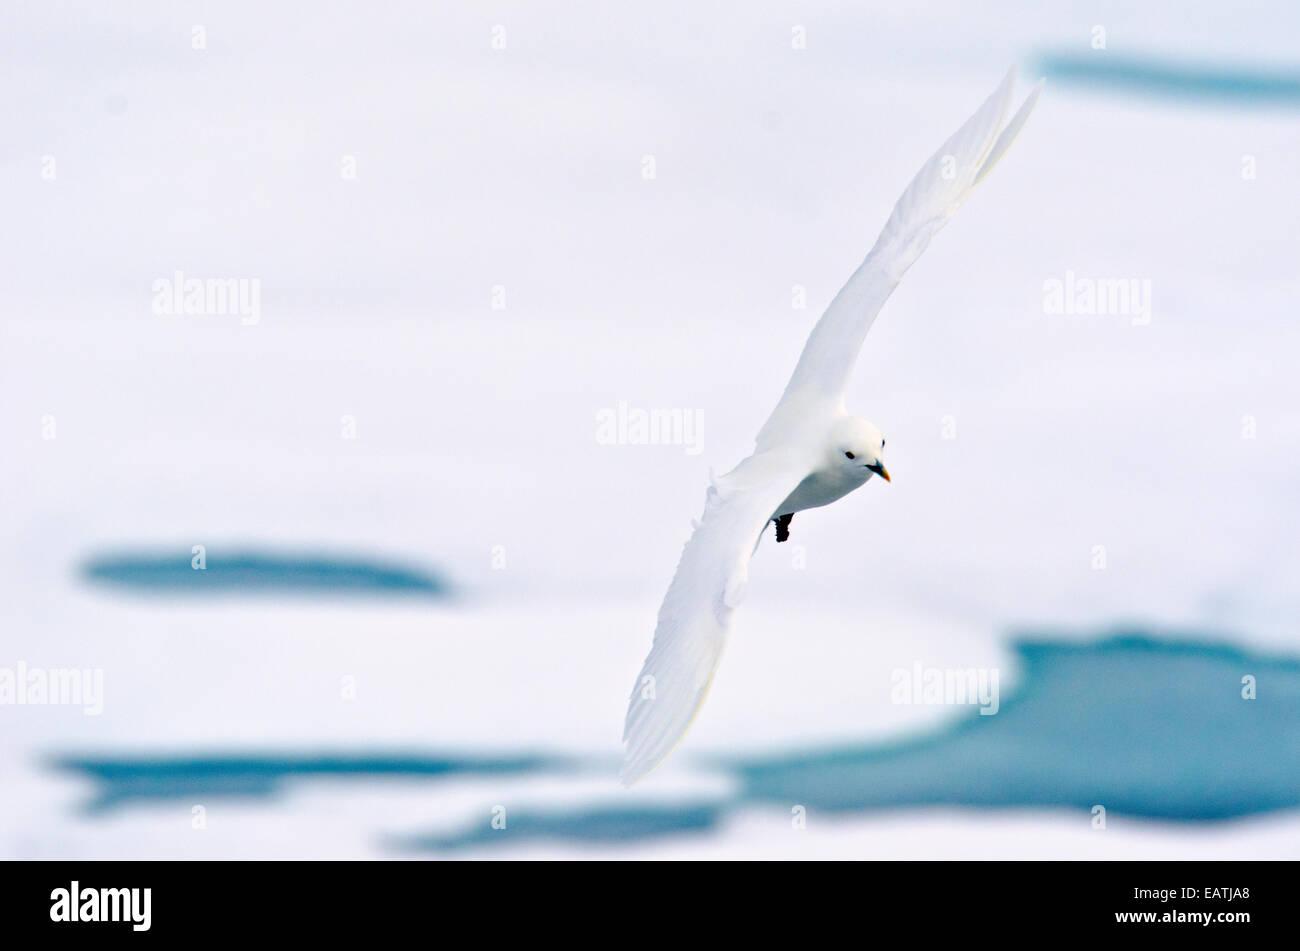 Rare sighting of an Ivory Gull, Pagophila eburnea soaring over the sea ice. - Stock Image